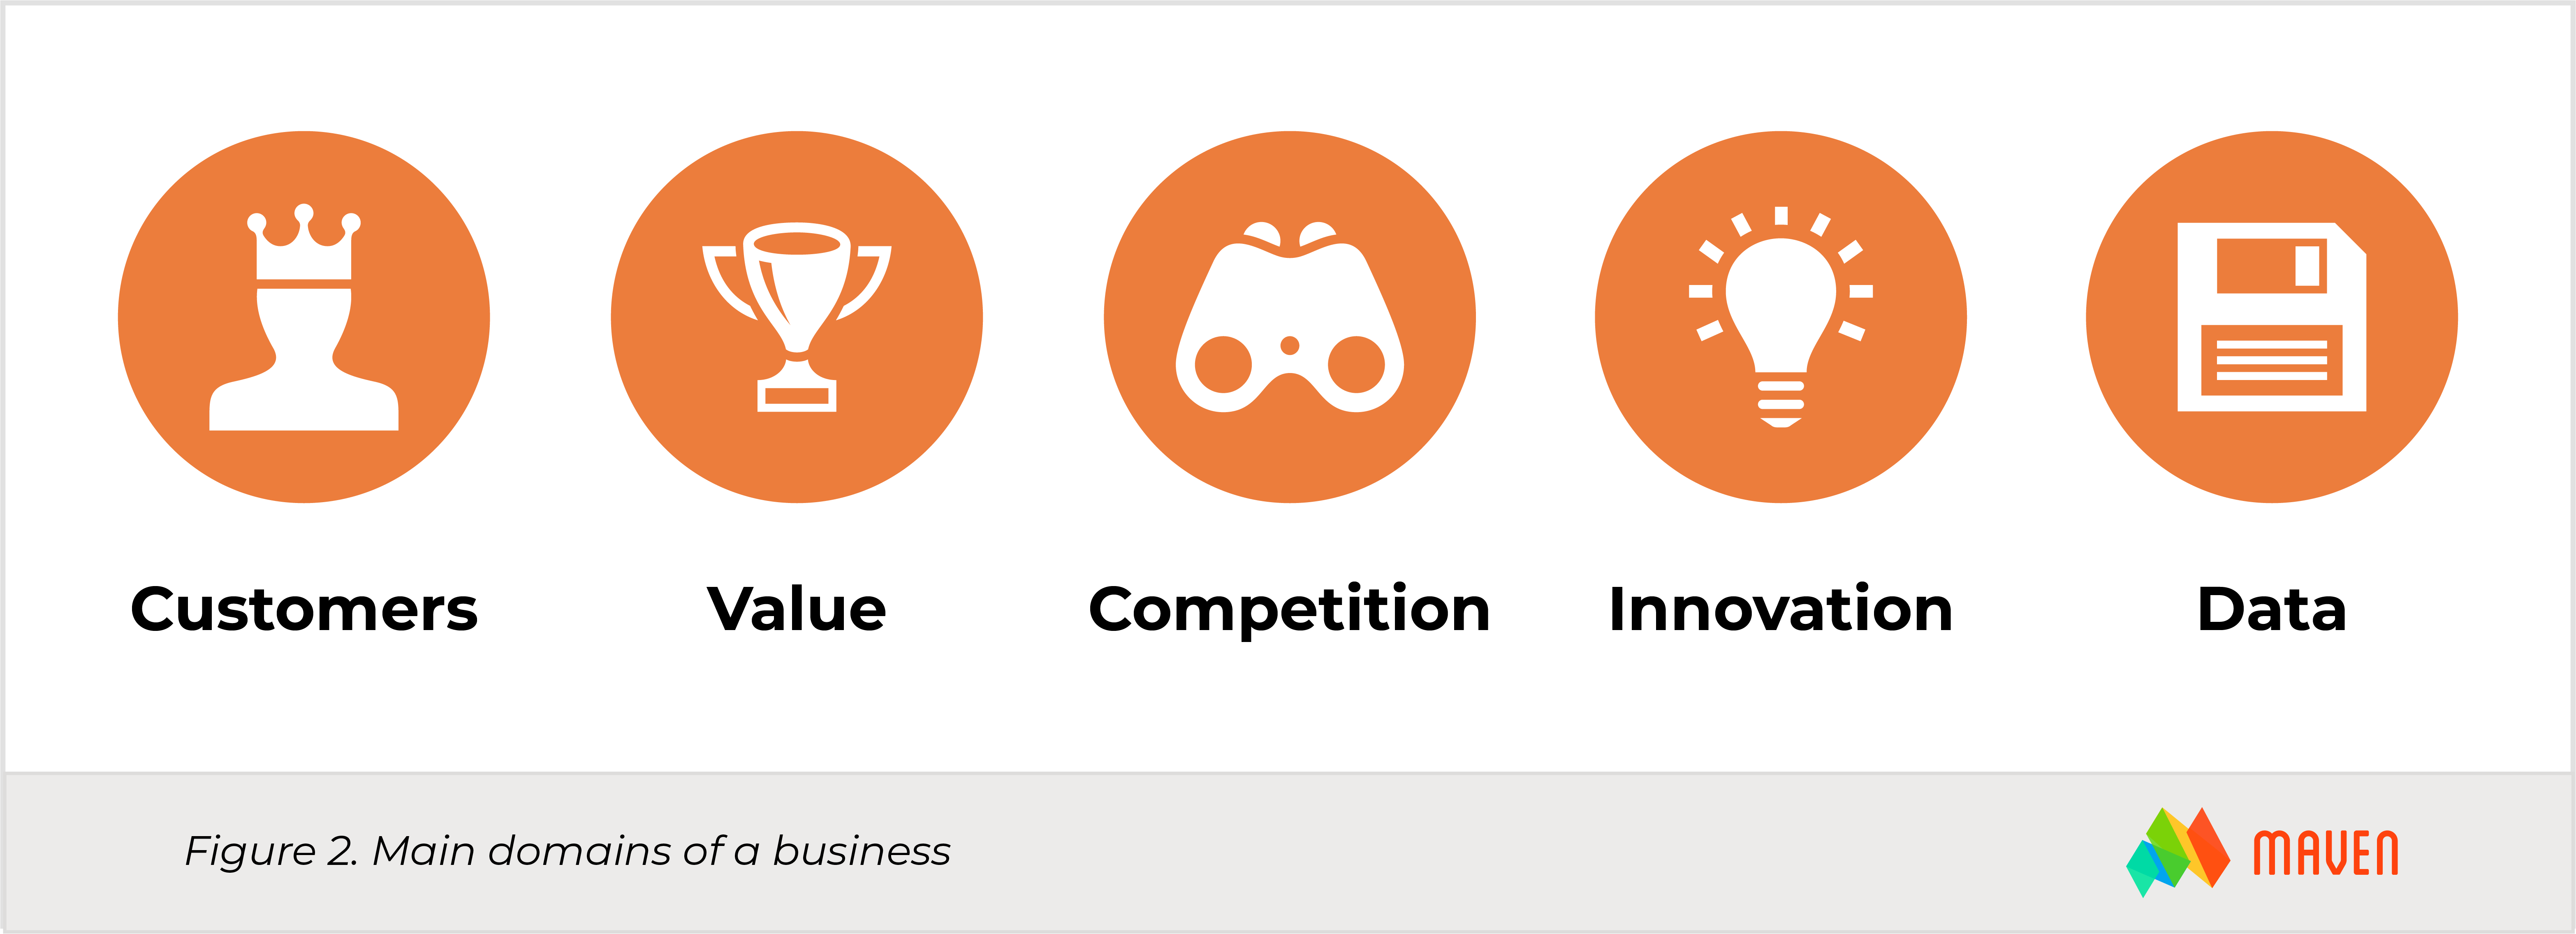 digital-transformation-Figure3-business-domains